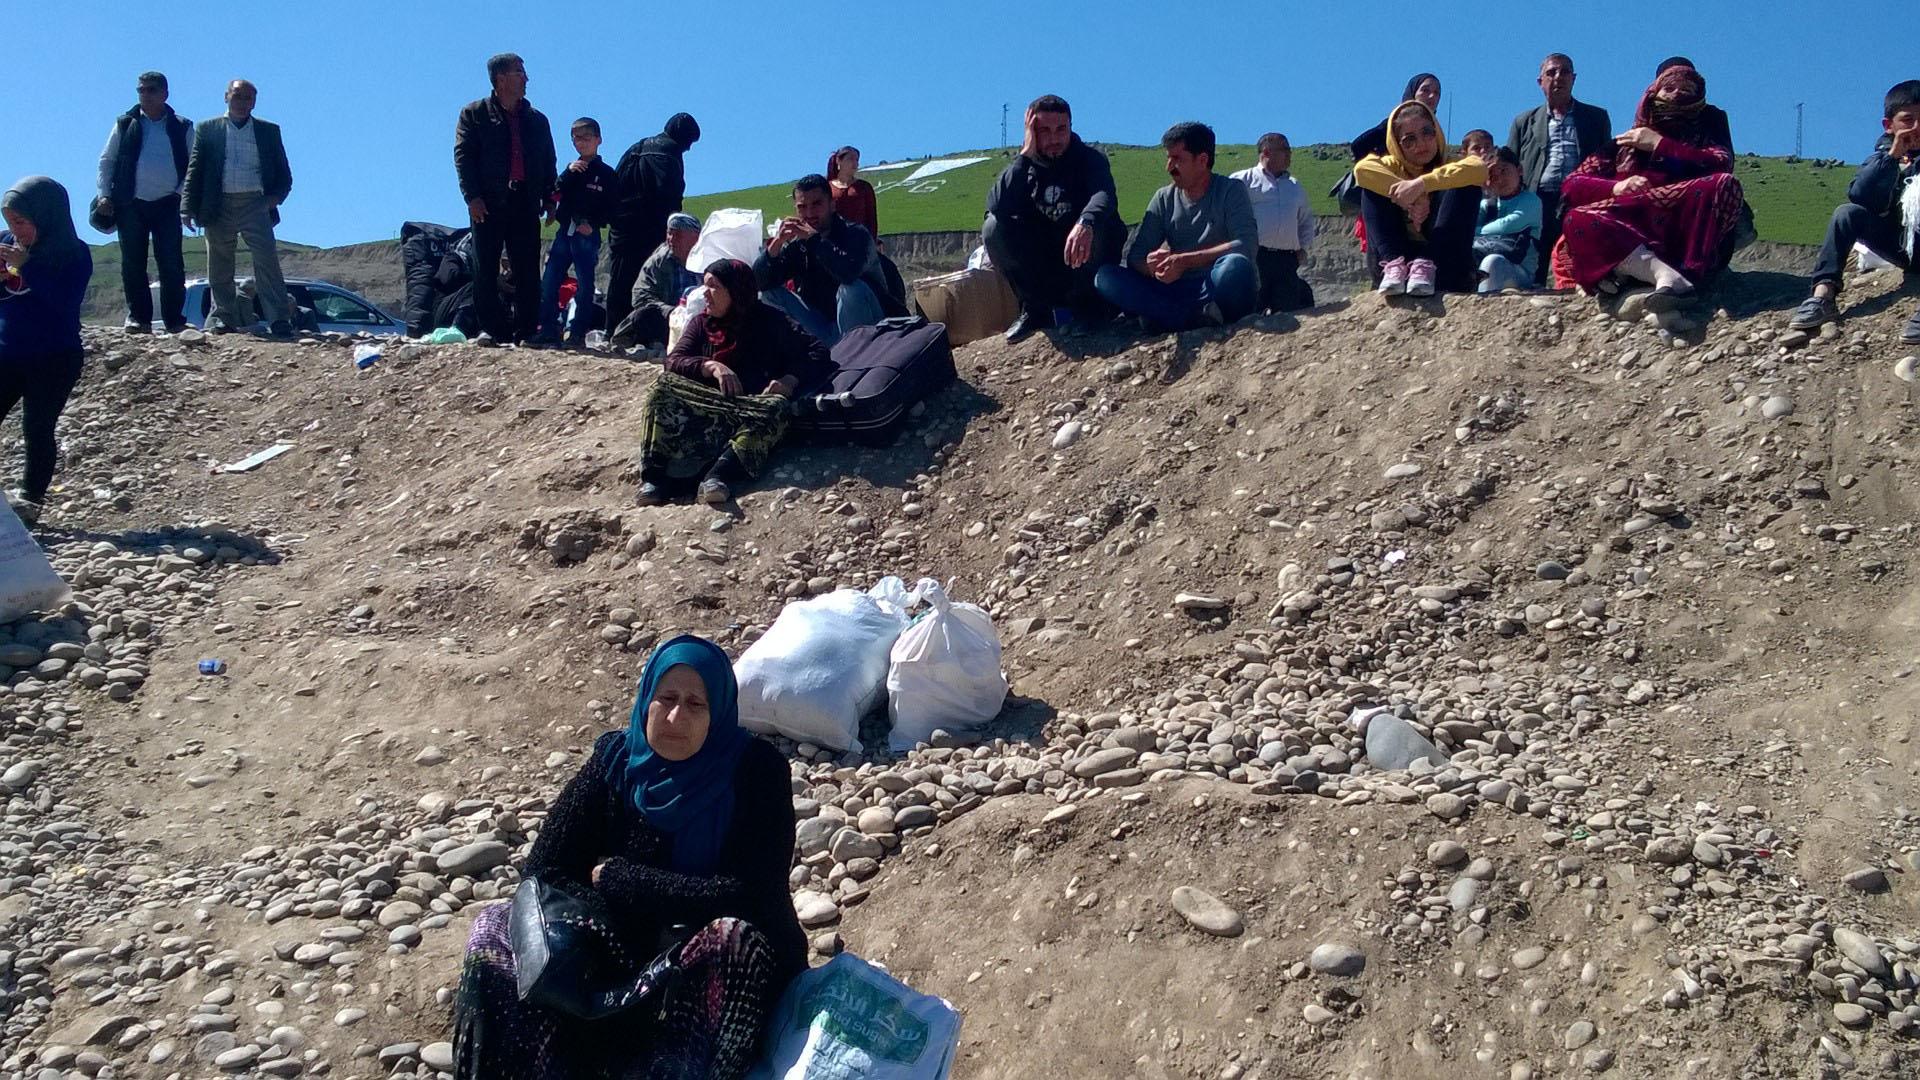 Kurds, Rojava region, Syrian civil war, Bashar al-Assad, ISIS, Syrian Kurds, Kurdish diaspora, refugee crisis